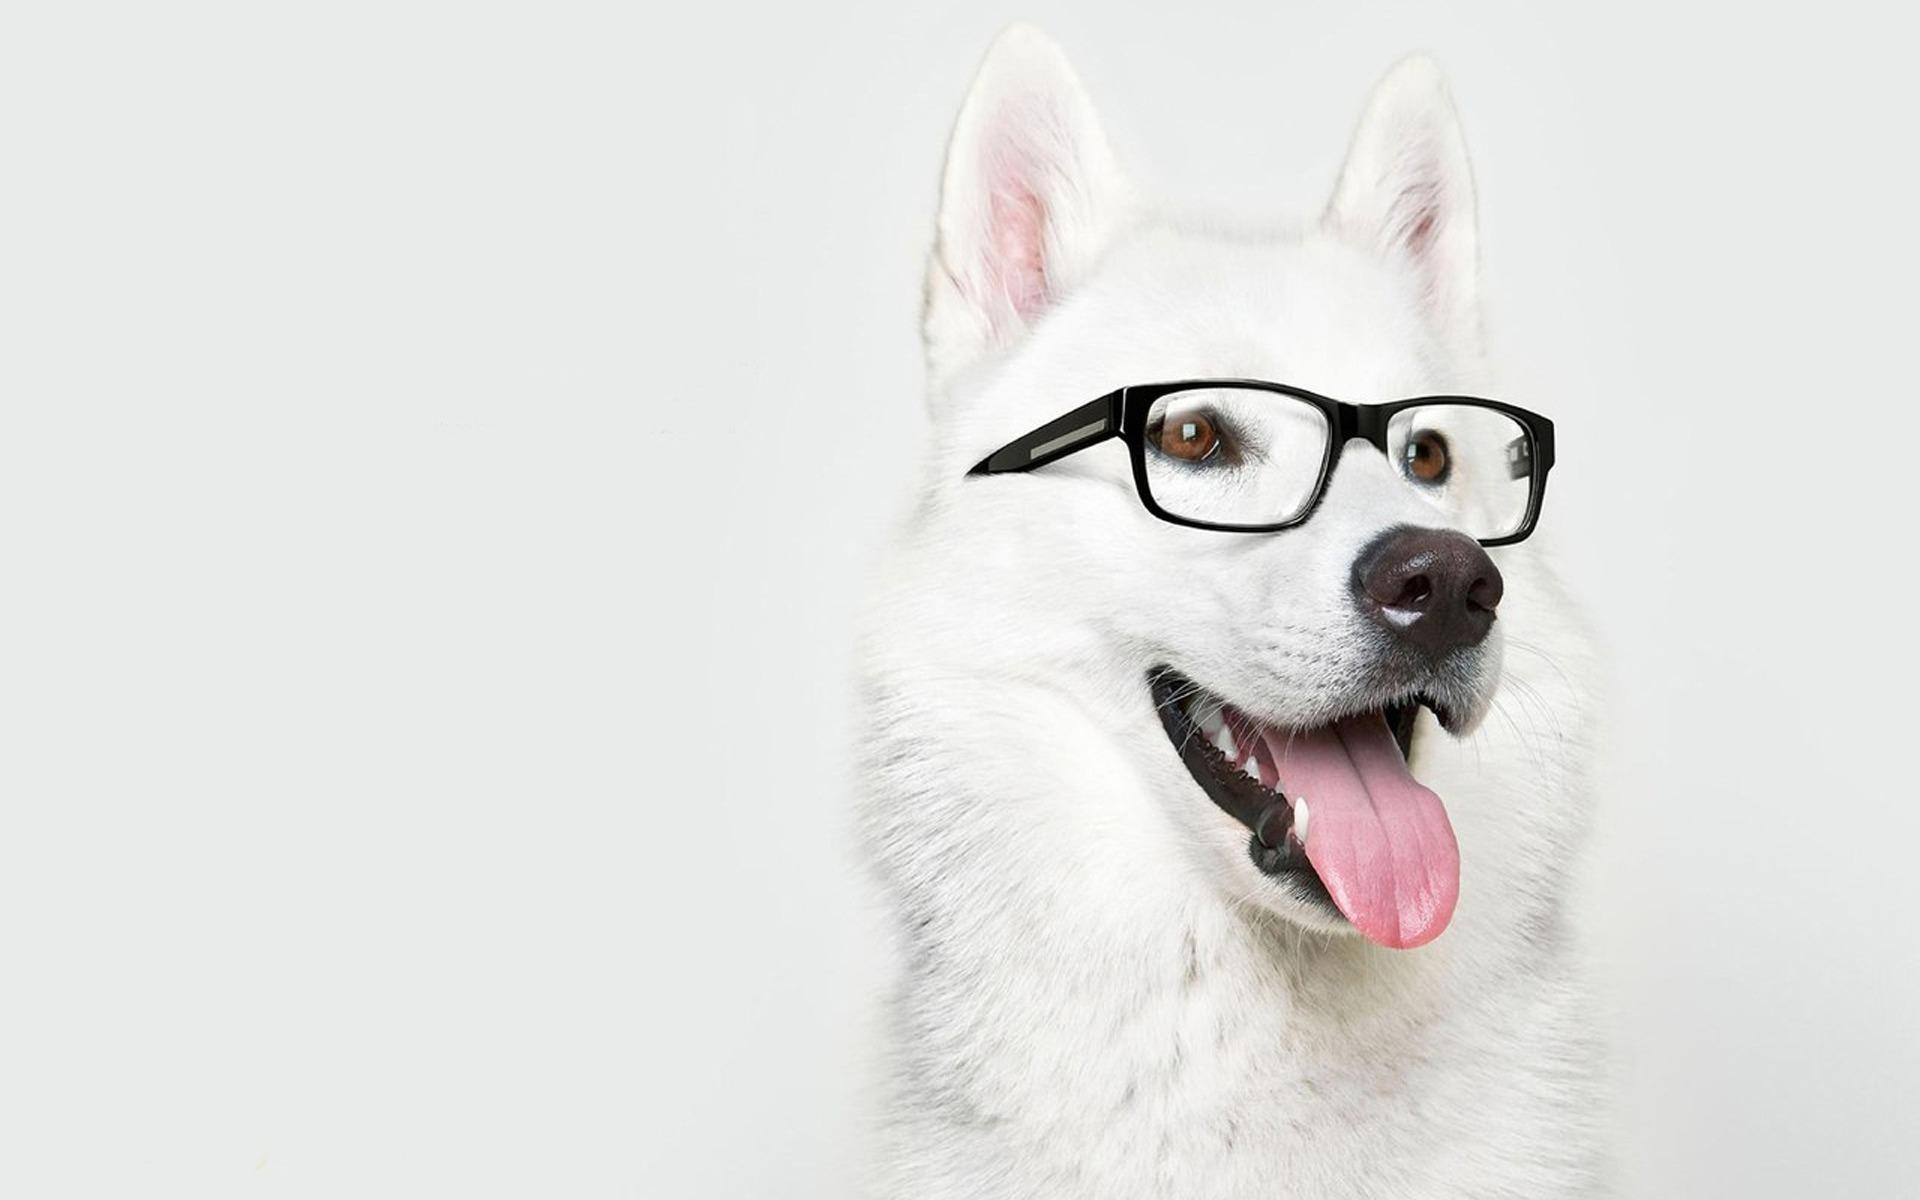 Funny Dog Wallpapers Hd Desktop Wallpapers 4k Hd